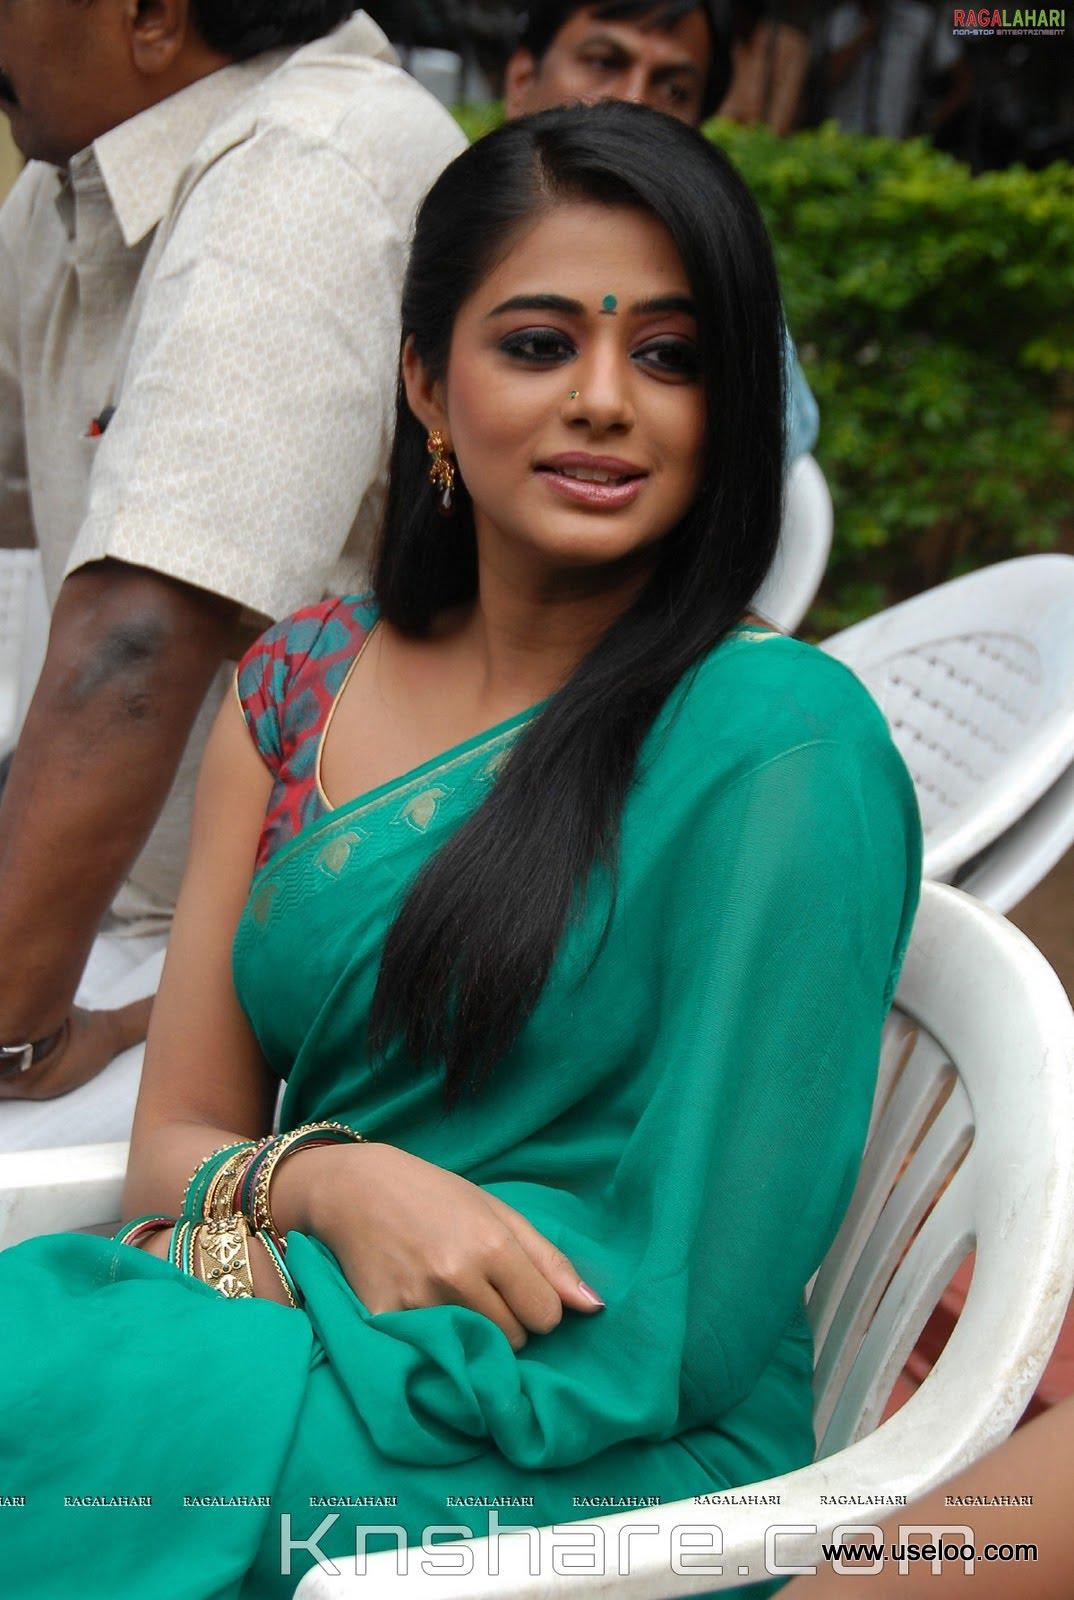 Priyamani Boobs And Curves  Hard On Guranteed - Indian -9428